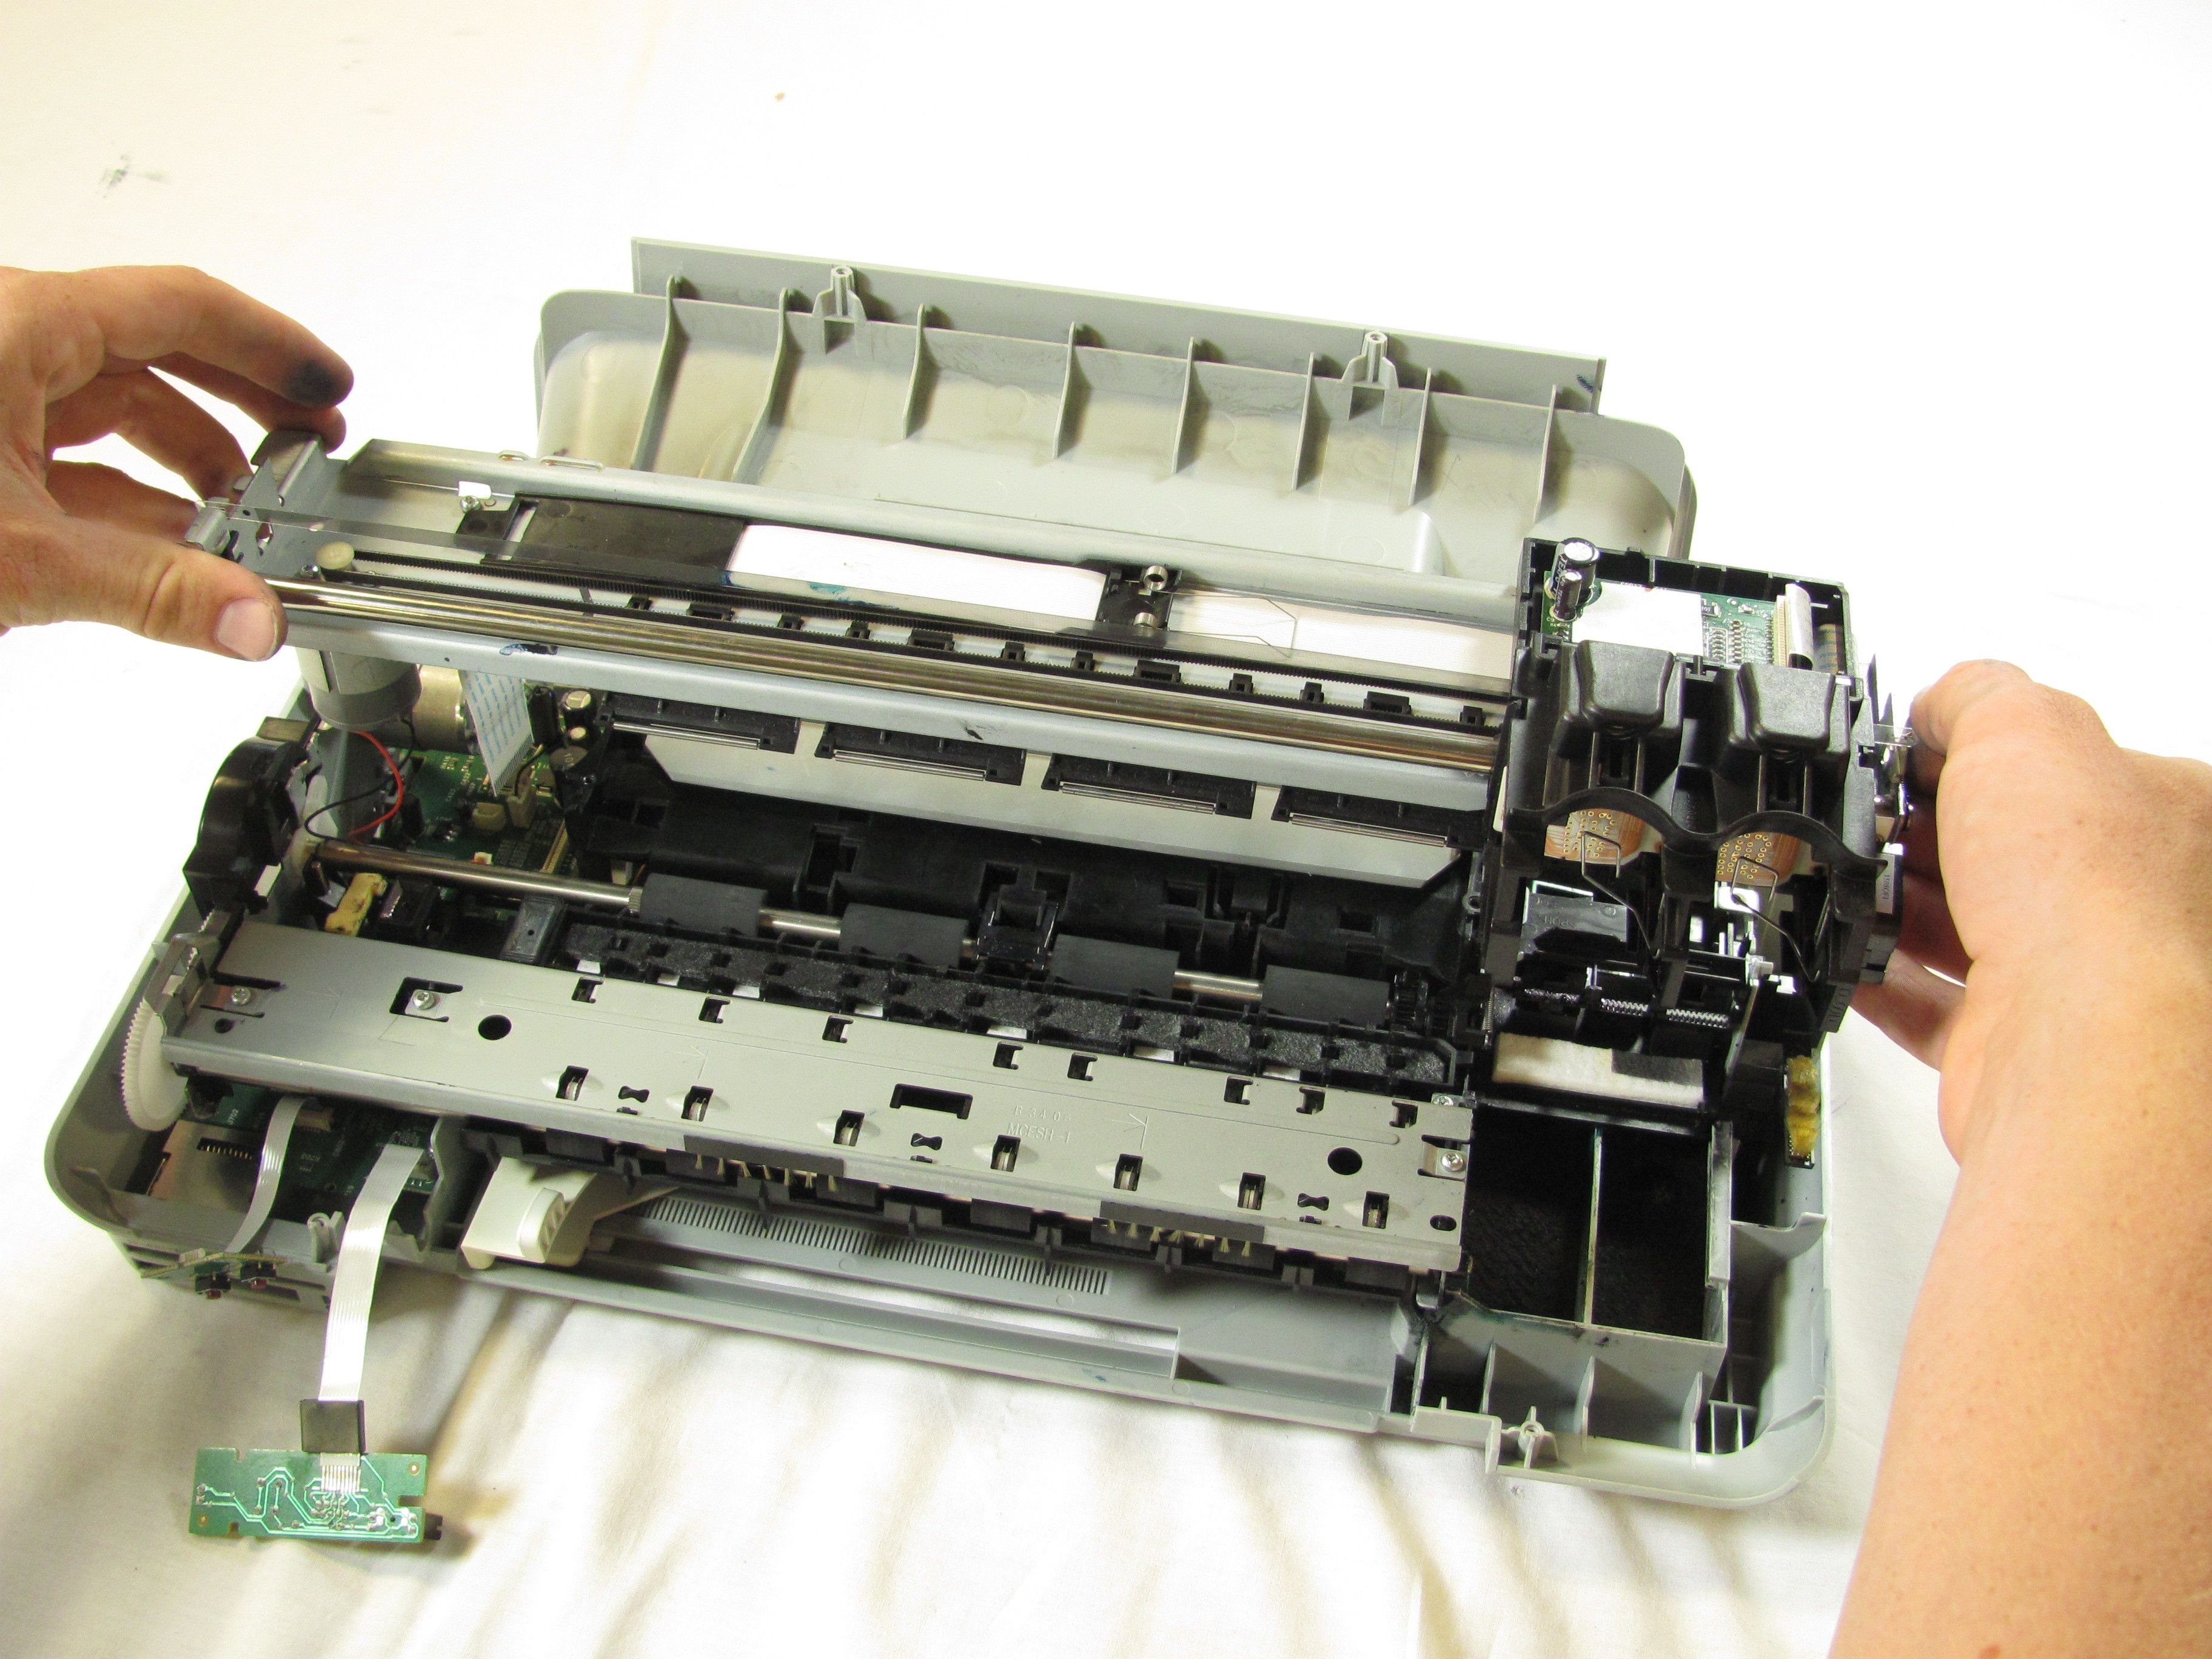 Disassembling HP Photosmart c3180 Ink Cartridge Track